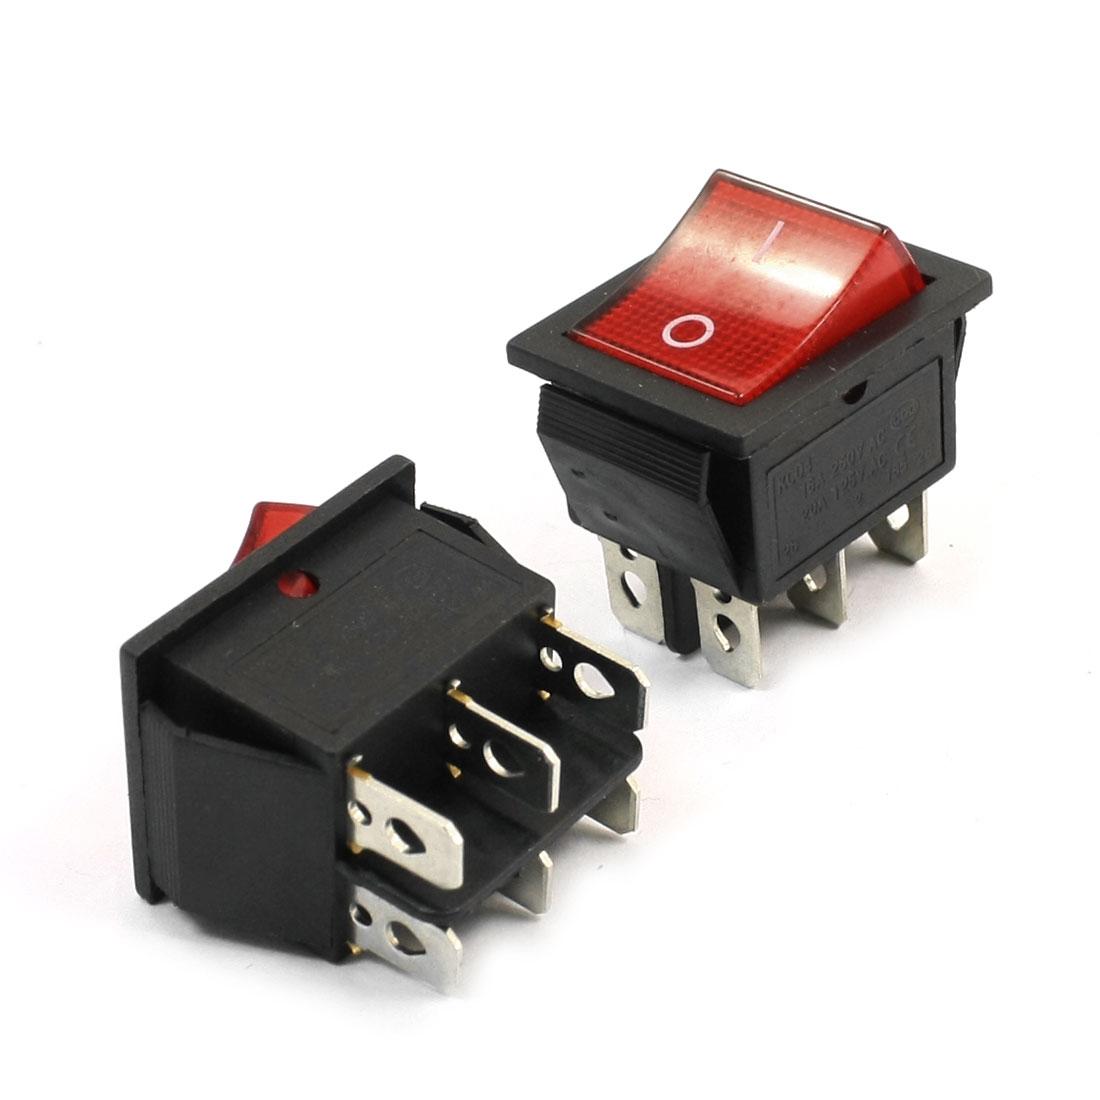 2 x Red Light Illuminated 6 Pin DPST 250VAC 16A 125VAC 20A Rocker Switch